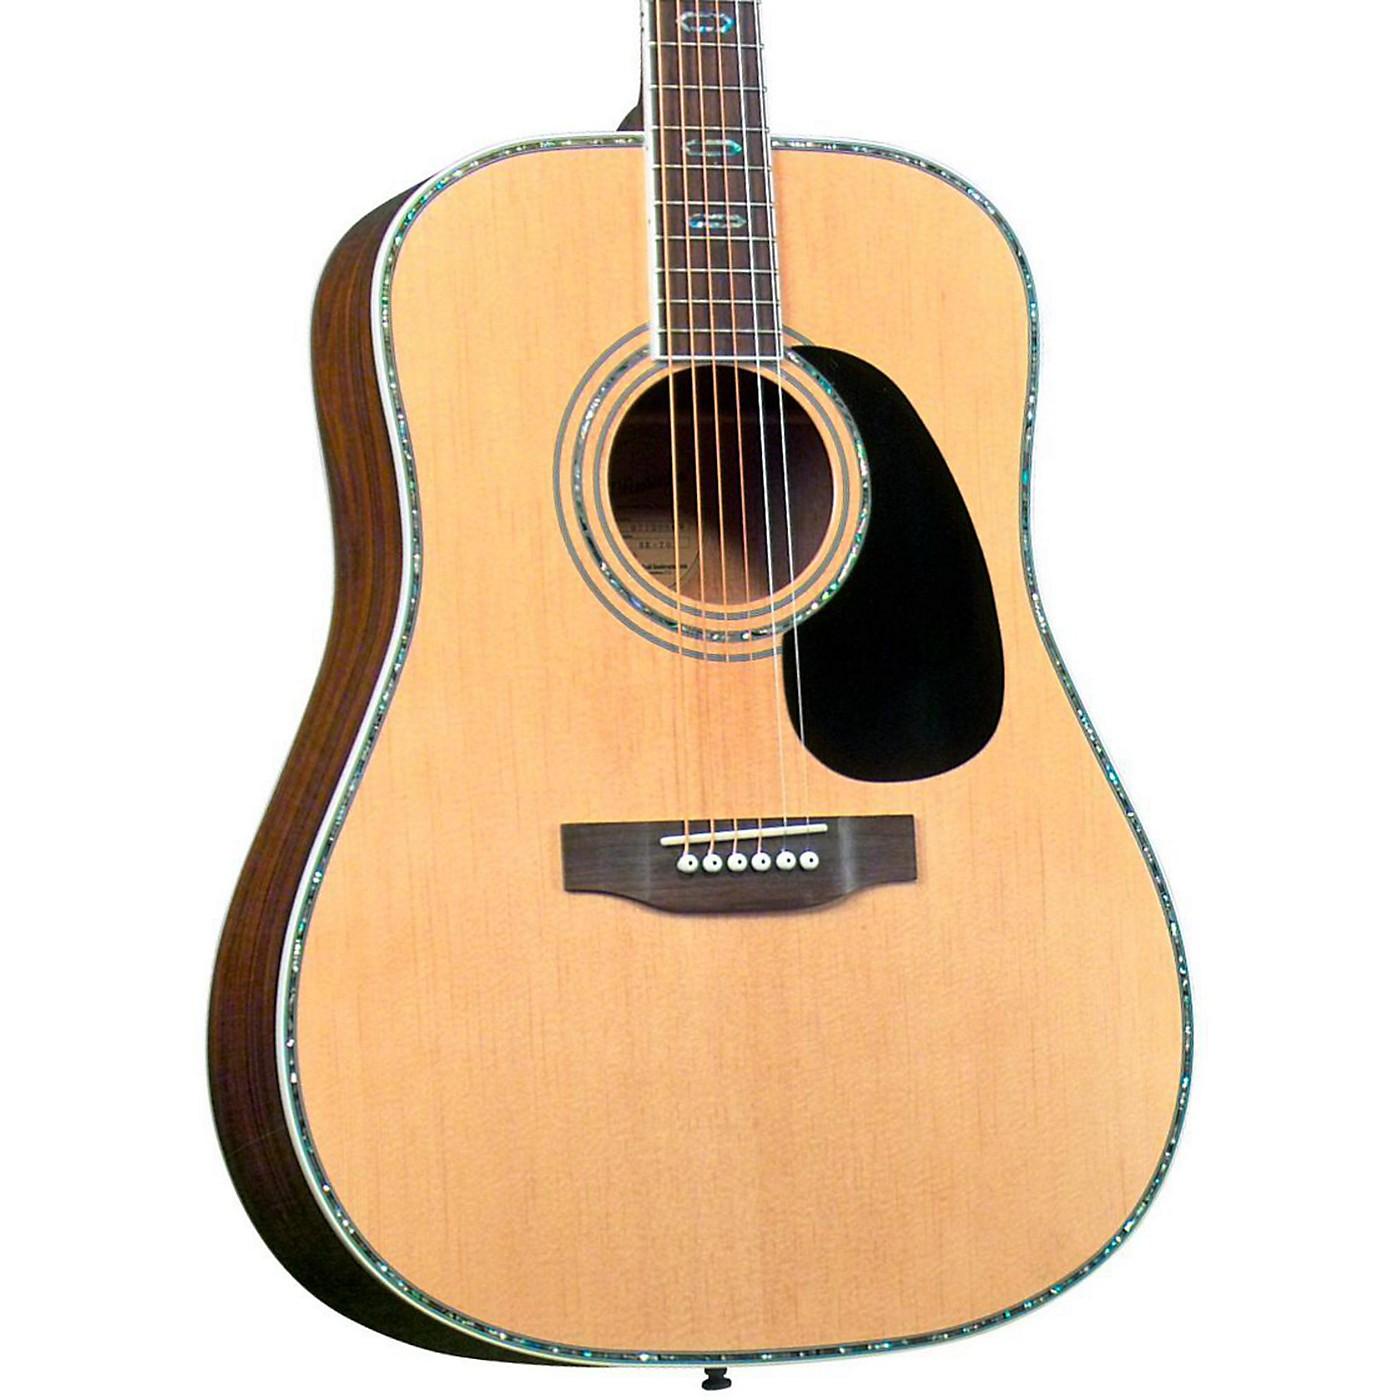 Blueridge Contemporary Series BR-70 Dreadnought Acoustic Guitar thumbnail